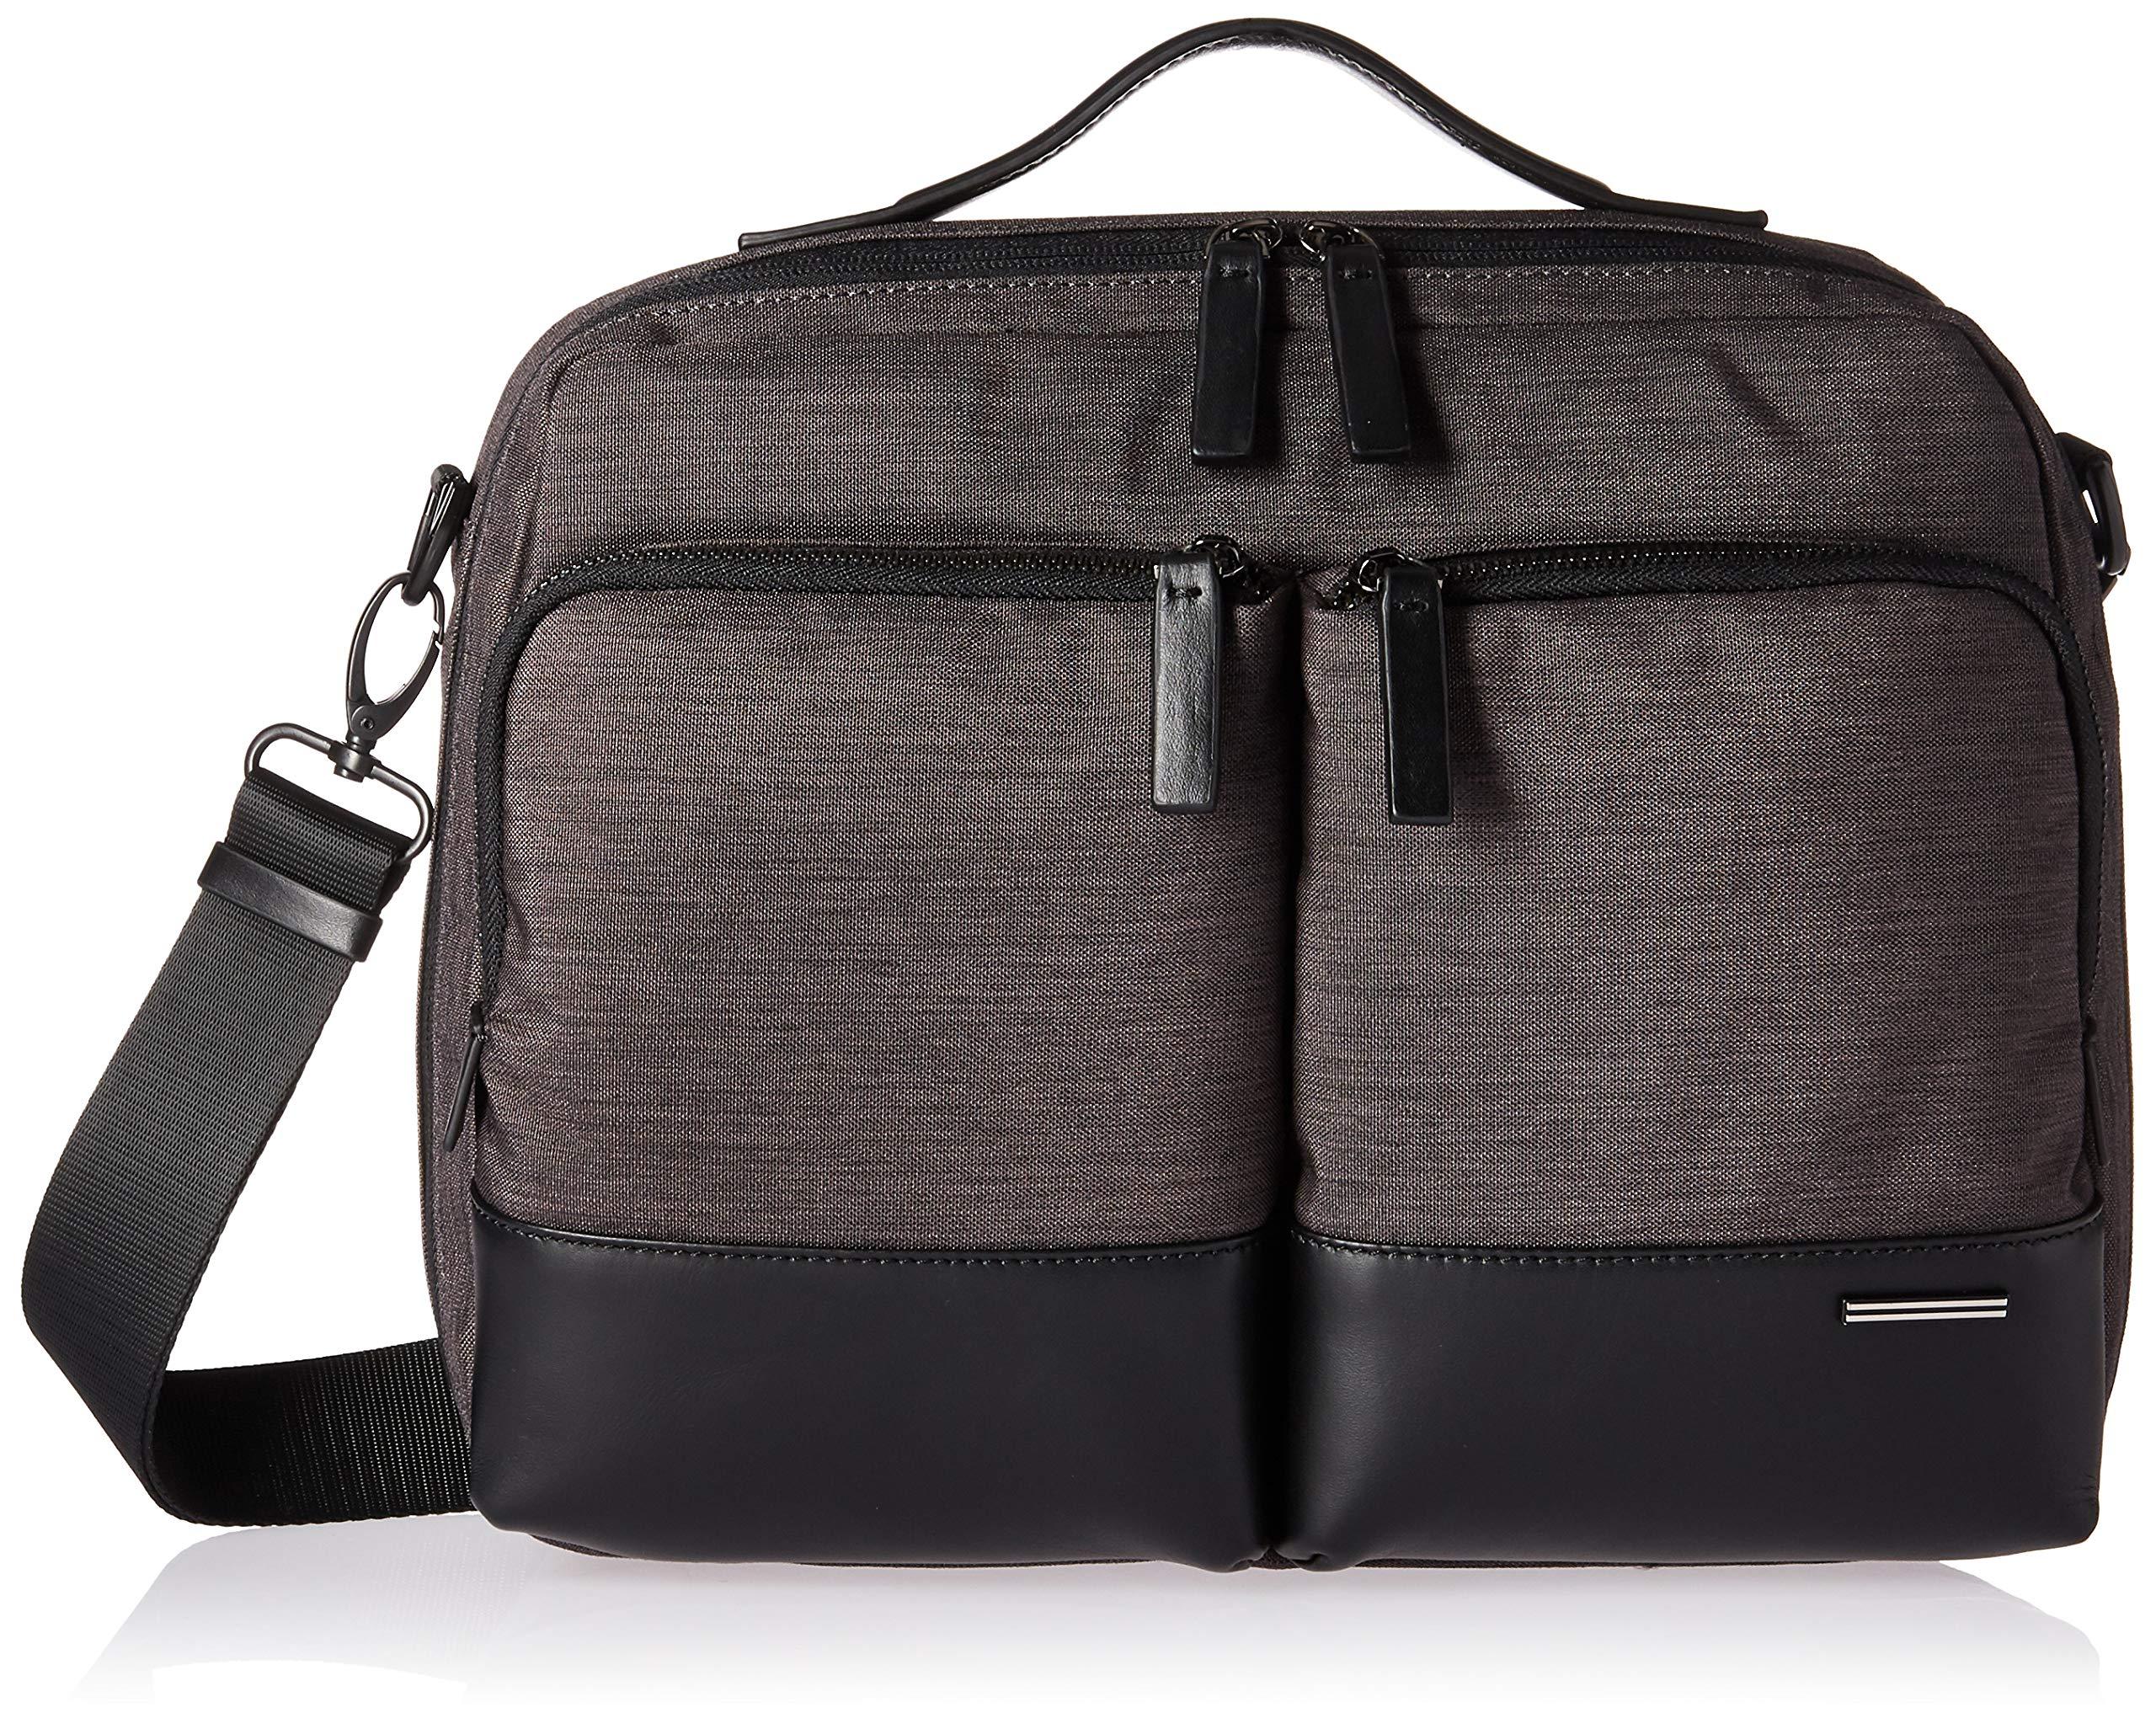 Zero Halliburton Lightweight Business-Shoulder Bag Laptop Messenger, Black, One Size